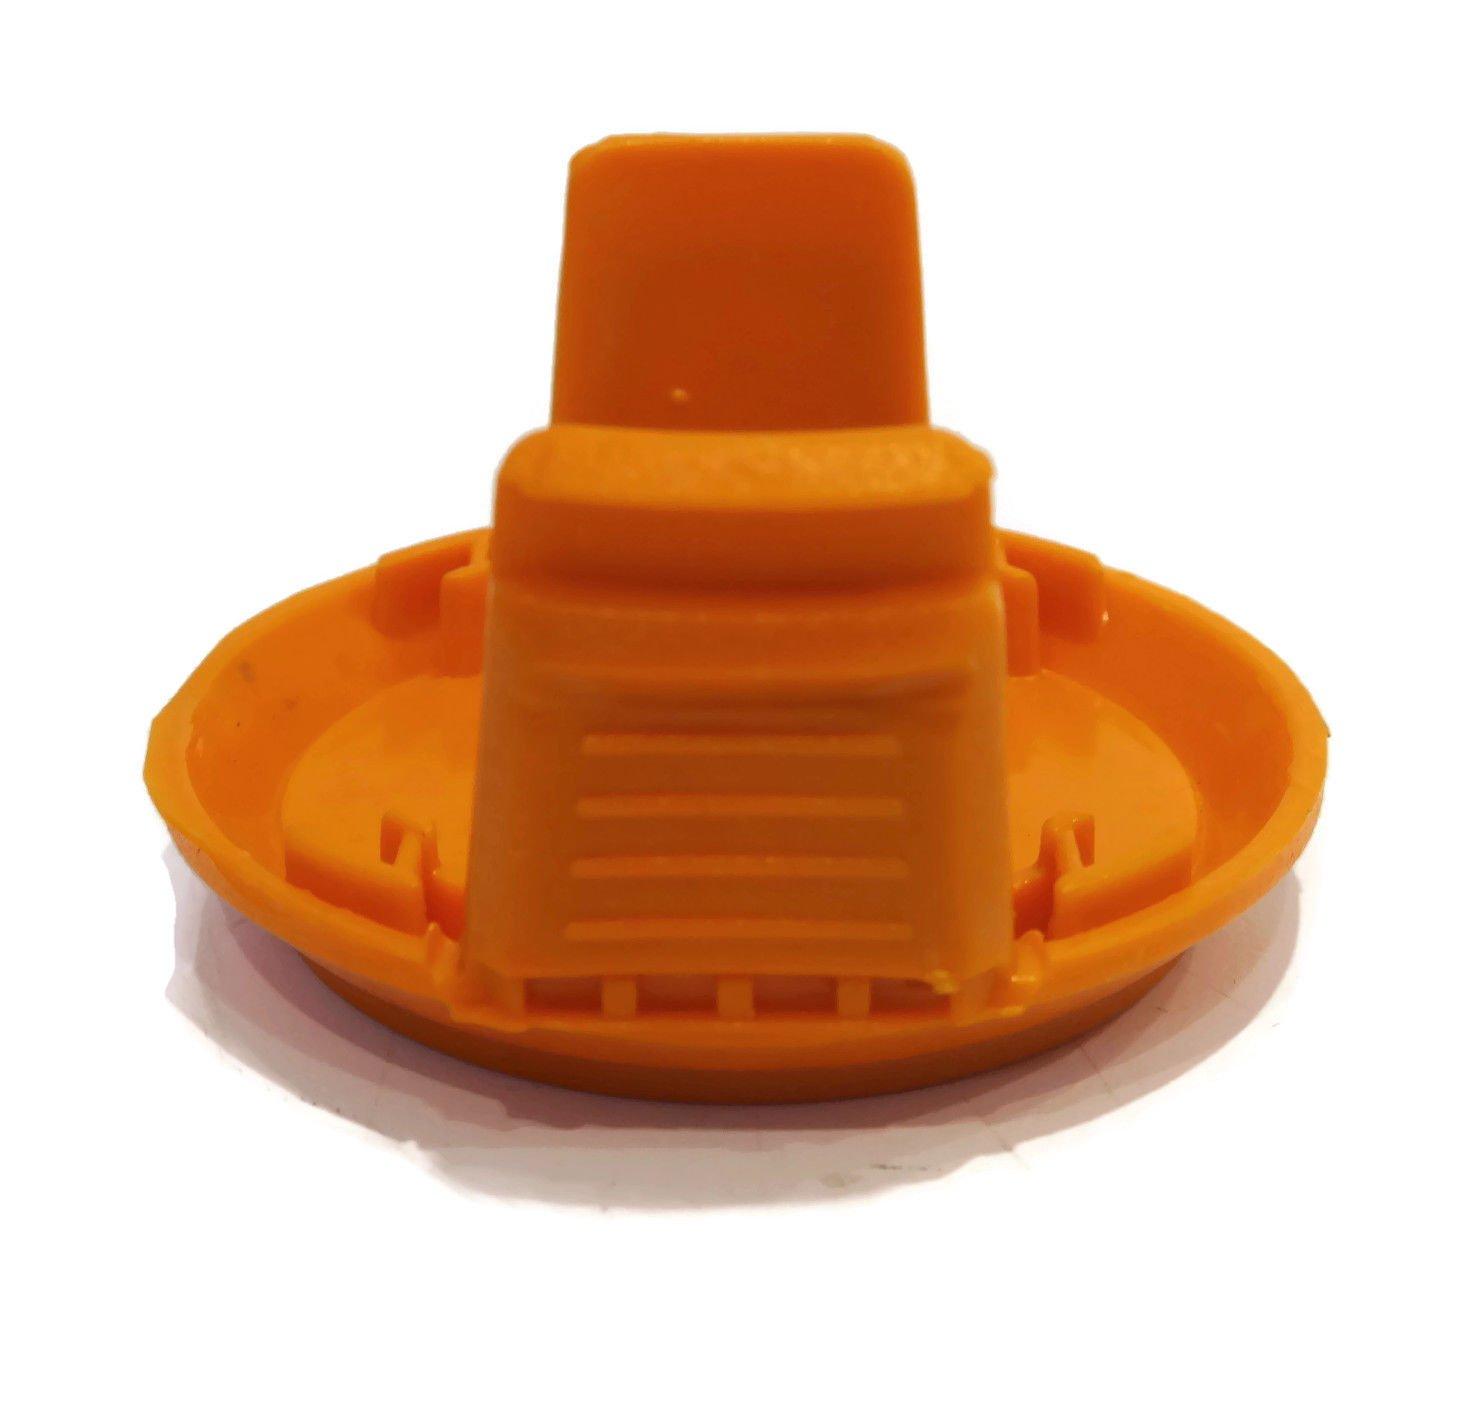 Spool Cap Covers for WA6531 Worx GT Models WG150 WG151 WG165 WG166 Trimmer 2 The ROP Shop